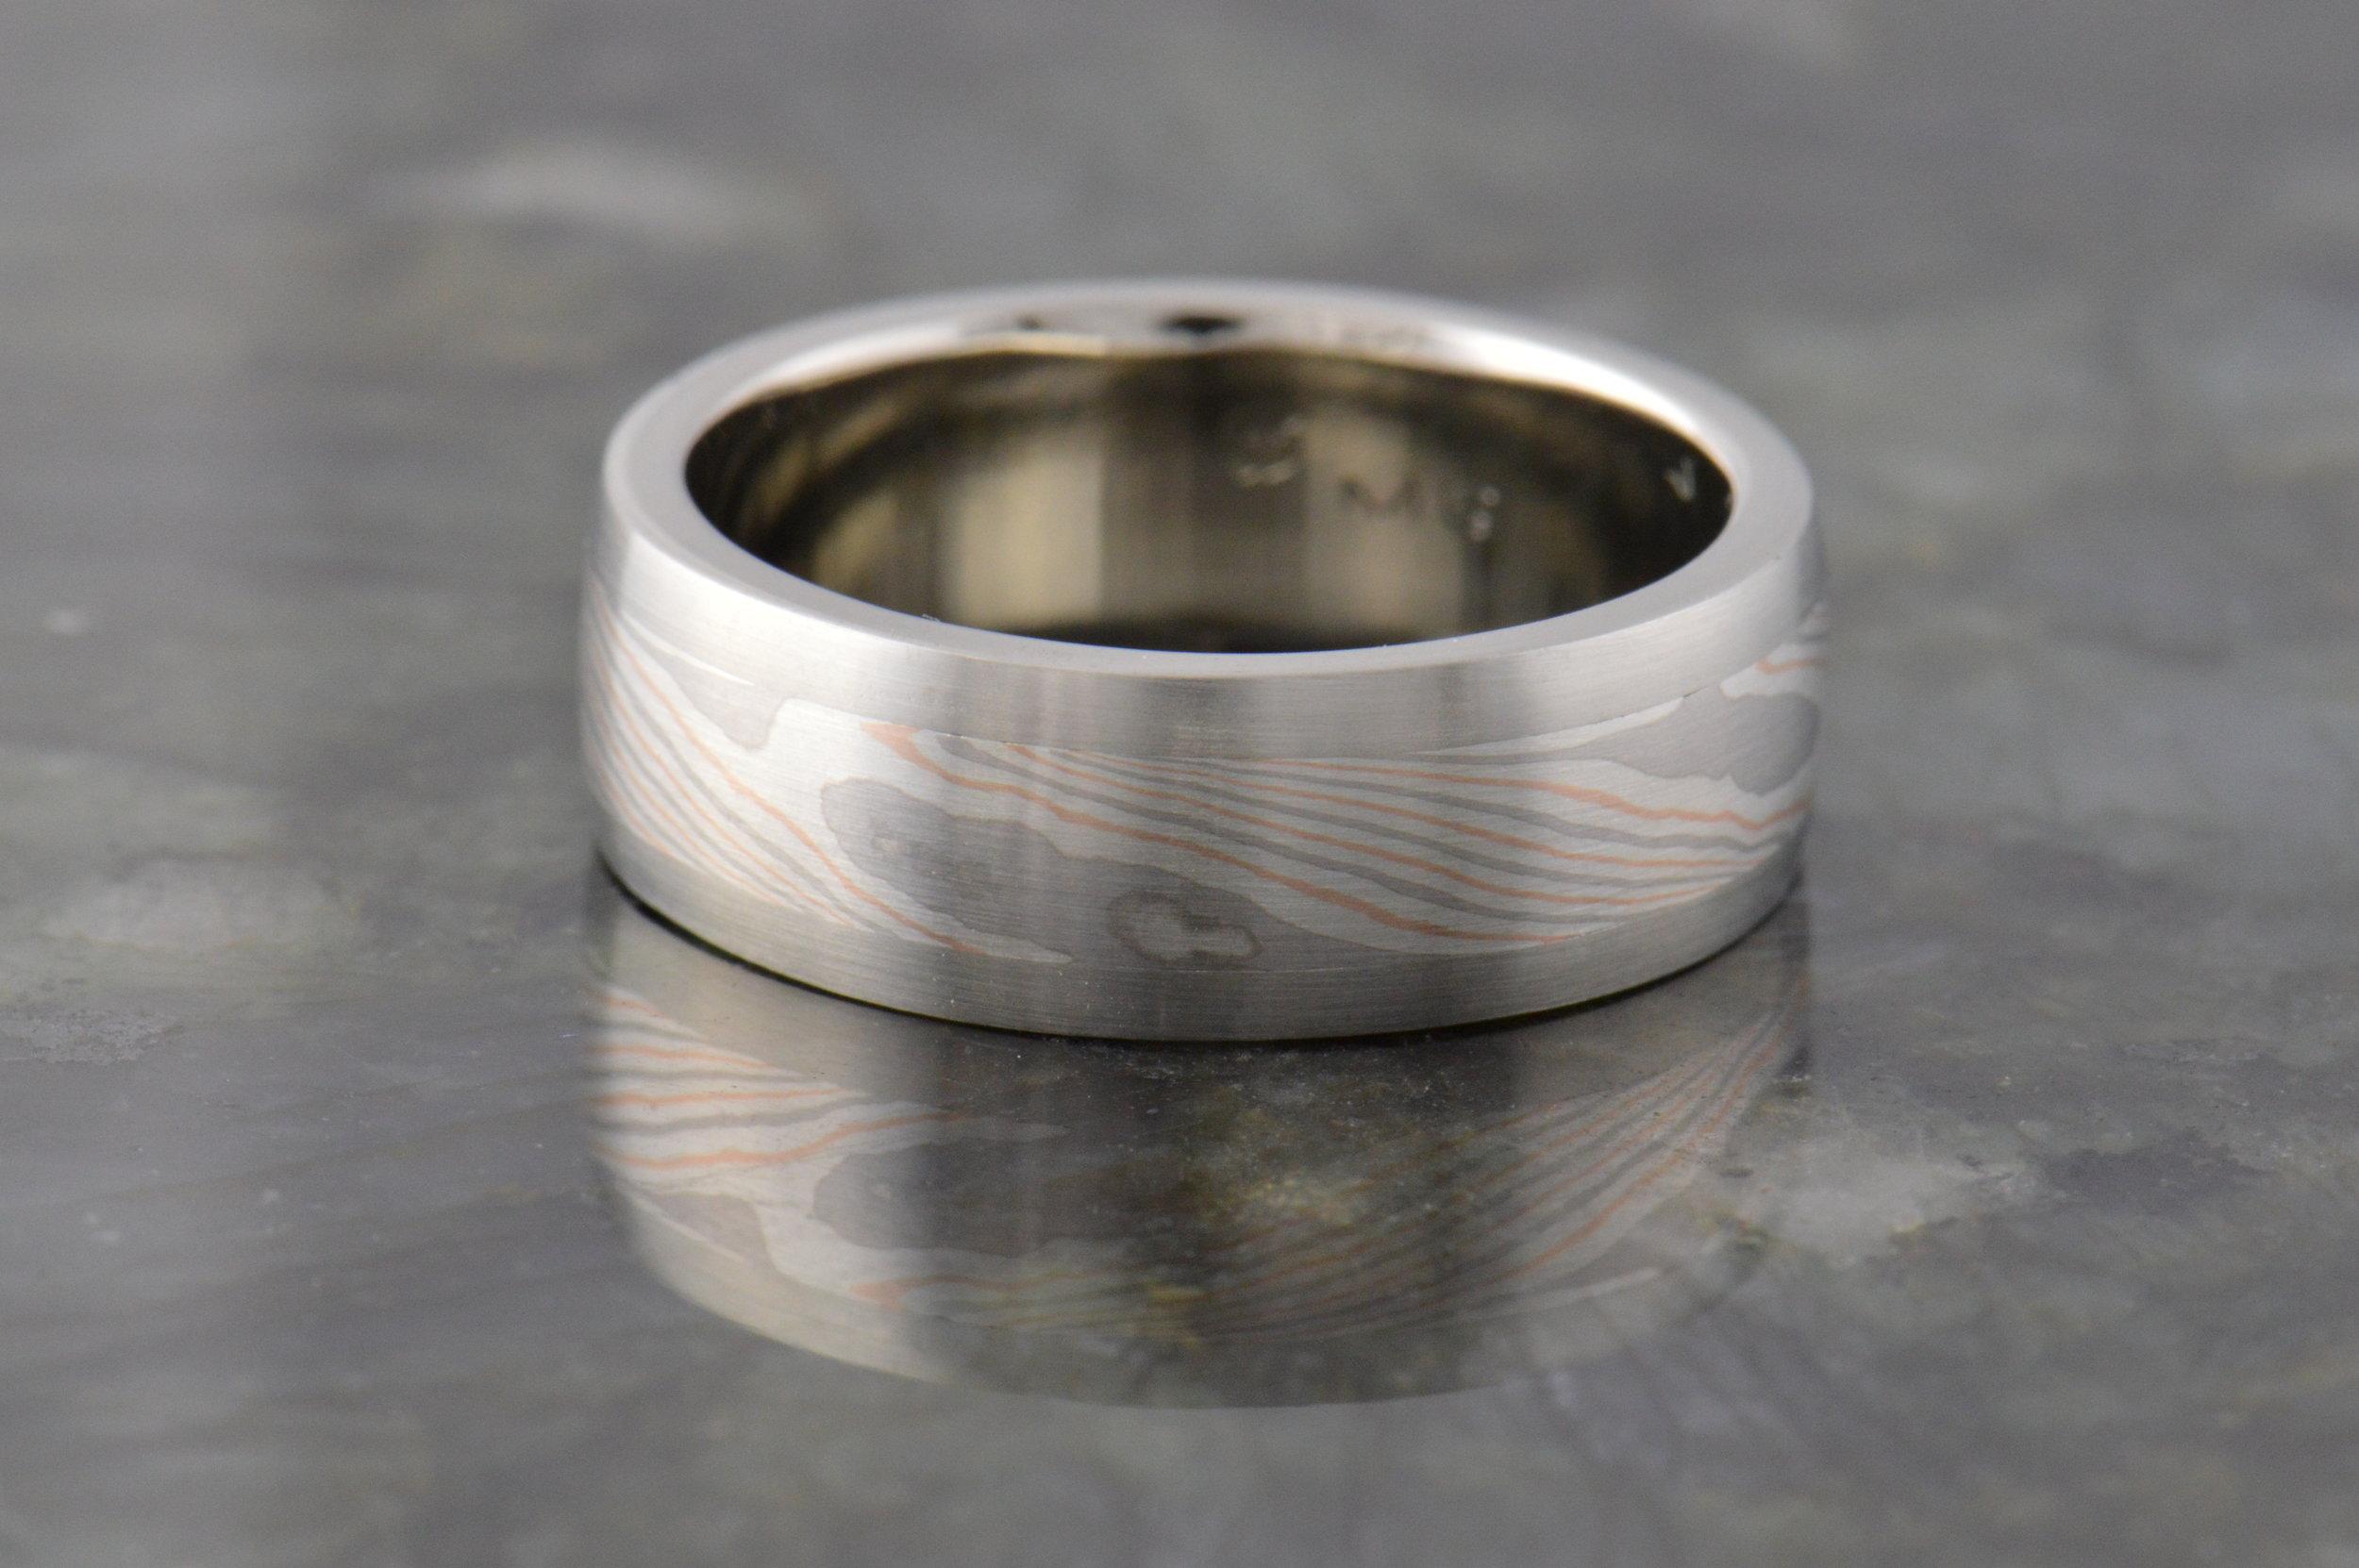 darvier-rare-un-etched-mokume-ring-rose-palladium-woodgrain.JPG